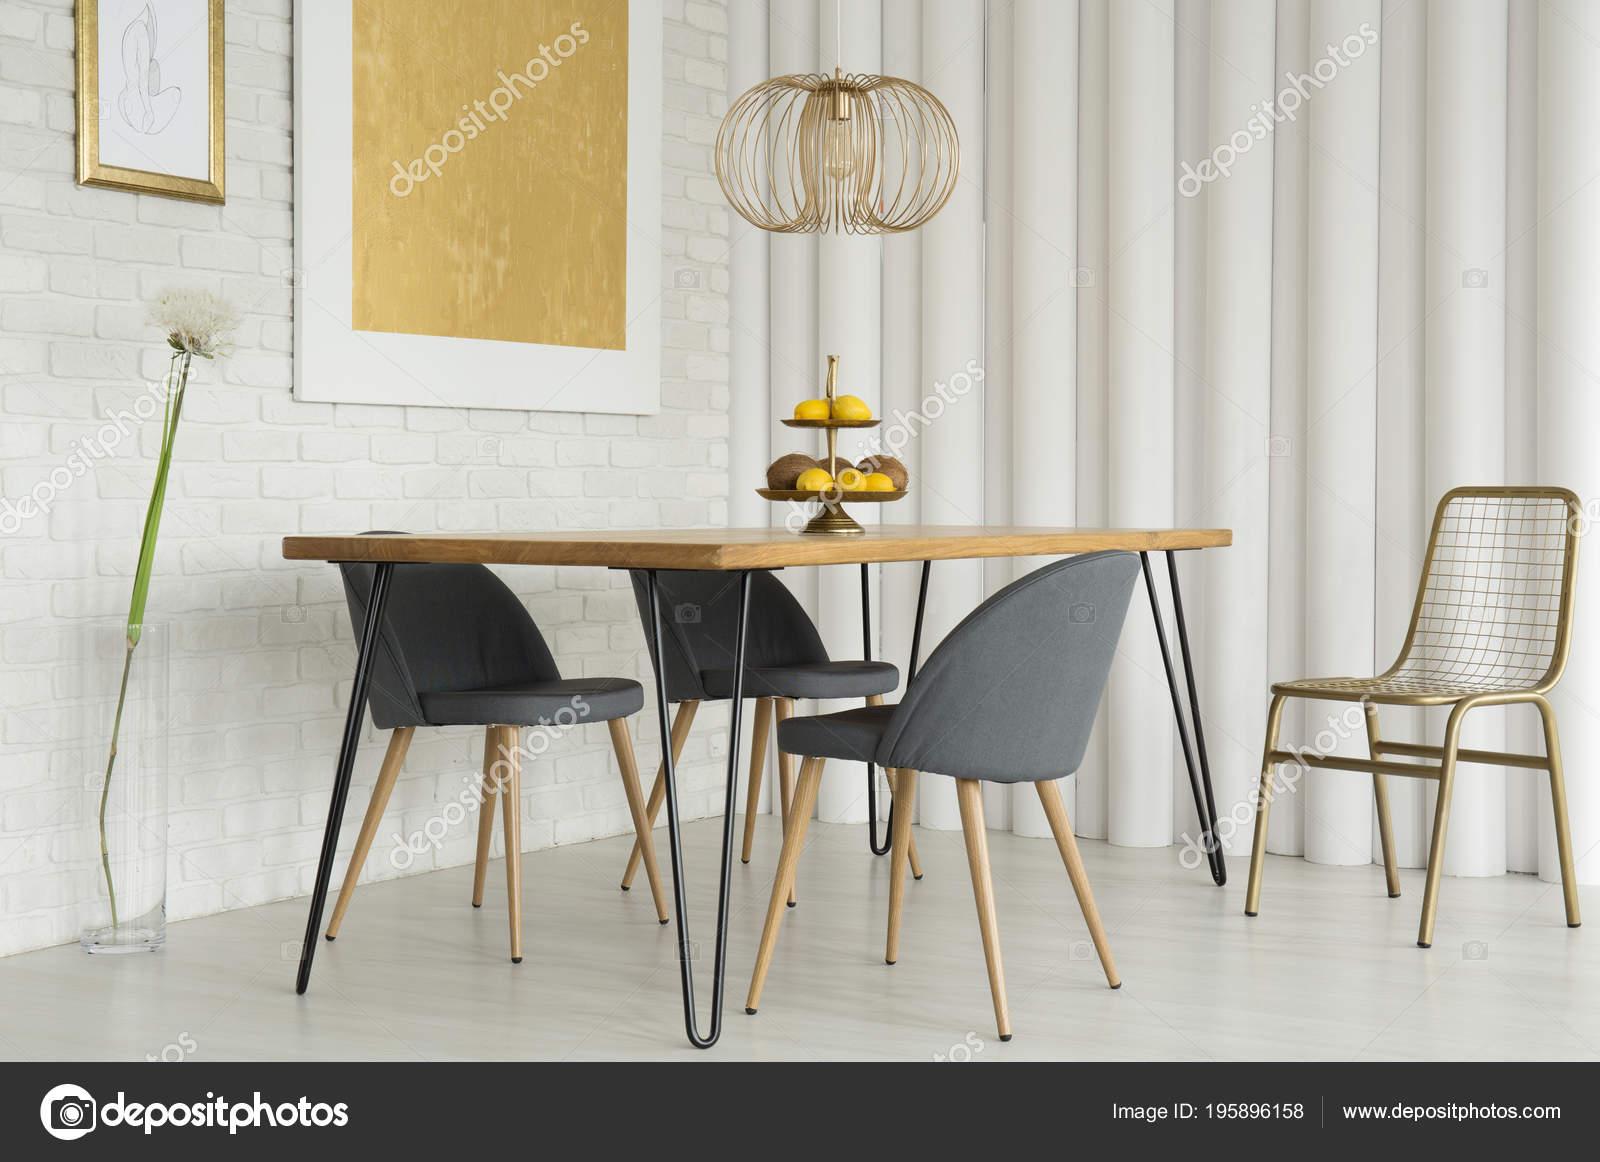 Simple Comedor Interior Con Pintura Oro Sillas Gris Pared Ladrillo ...